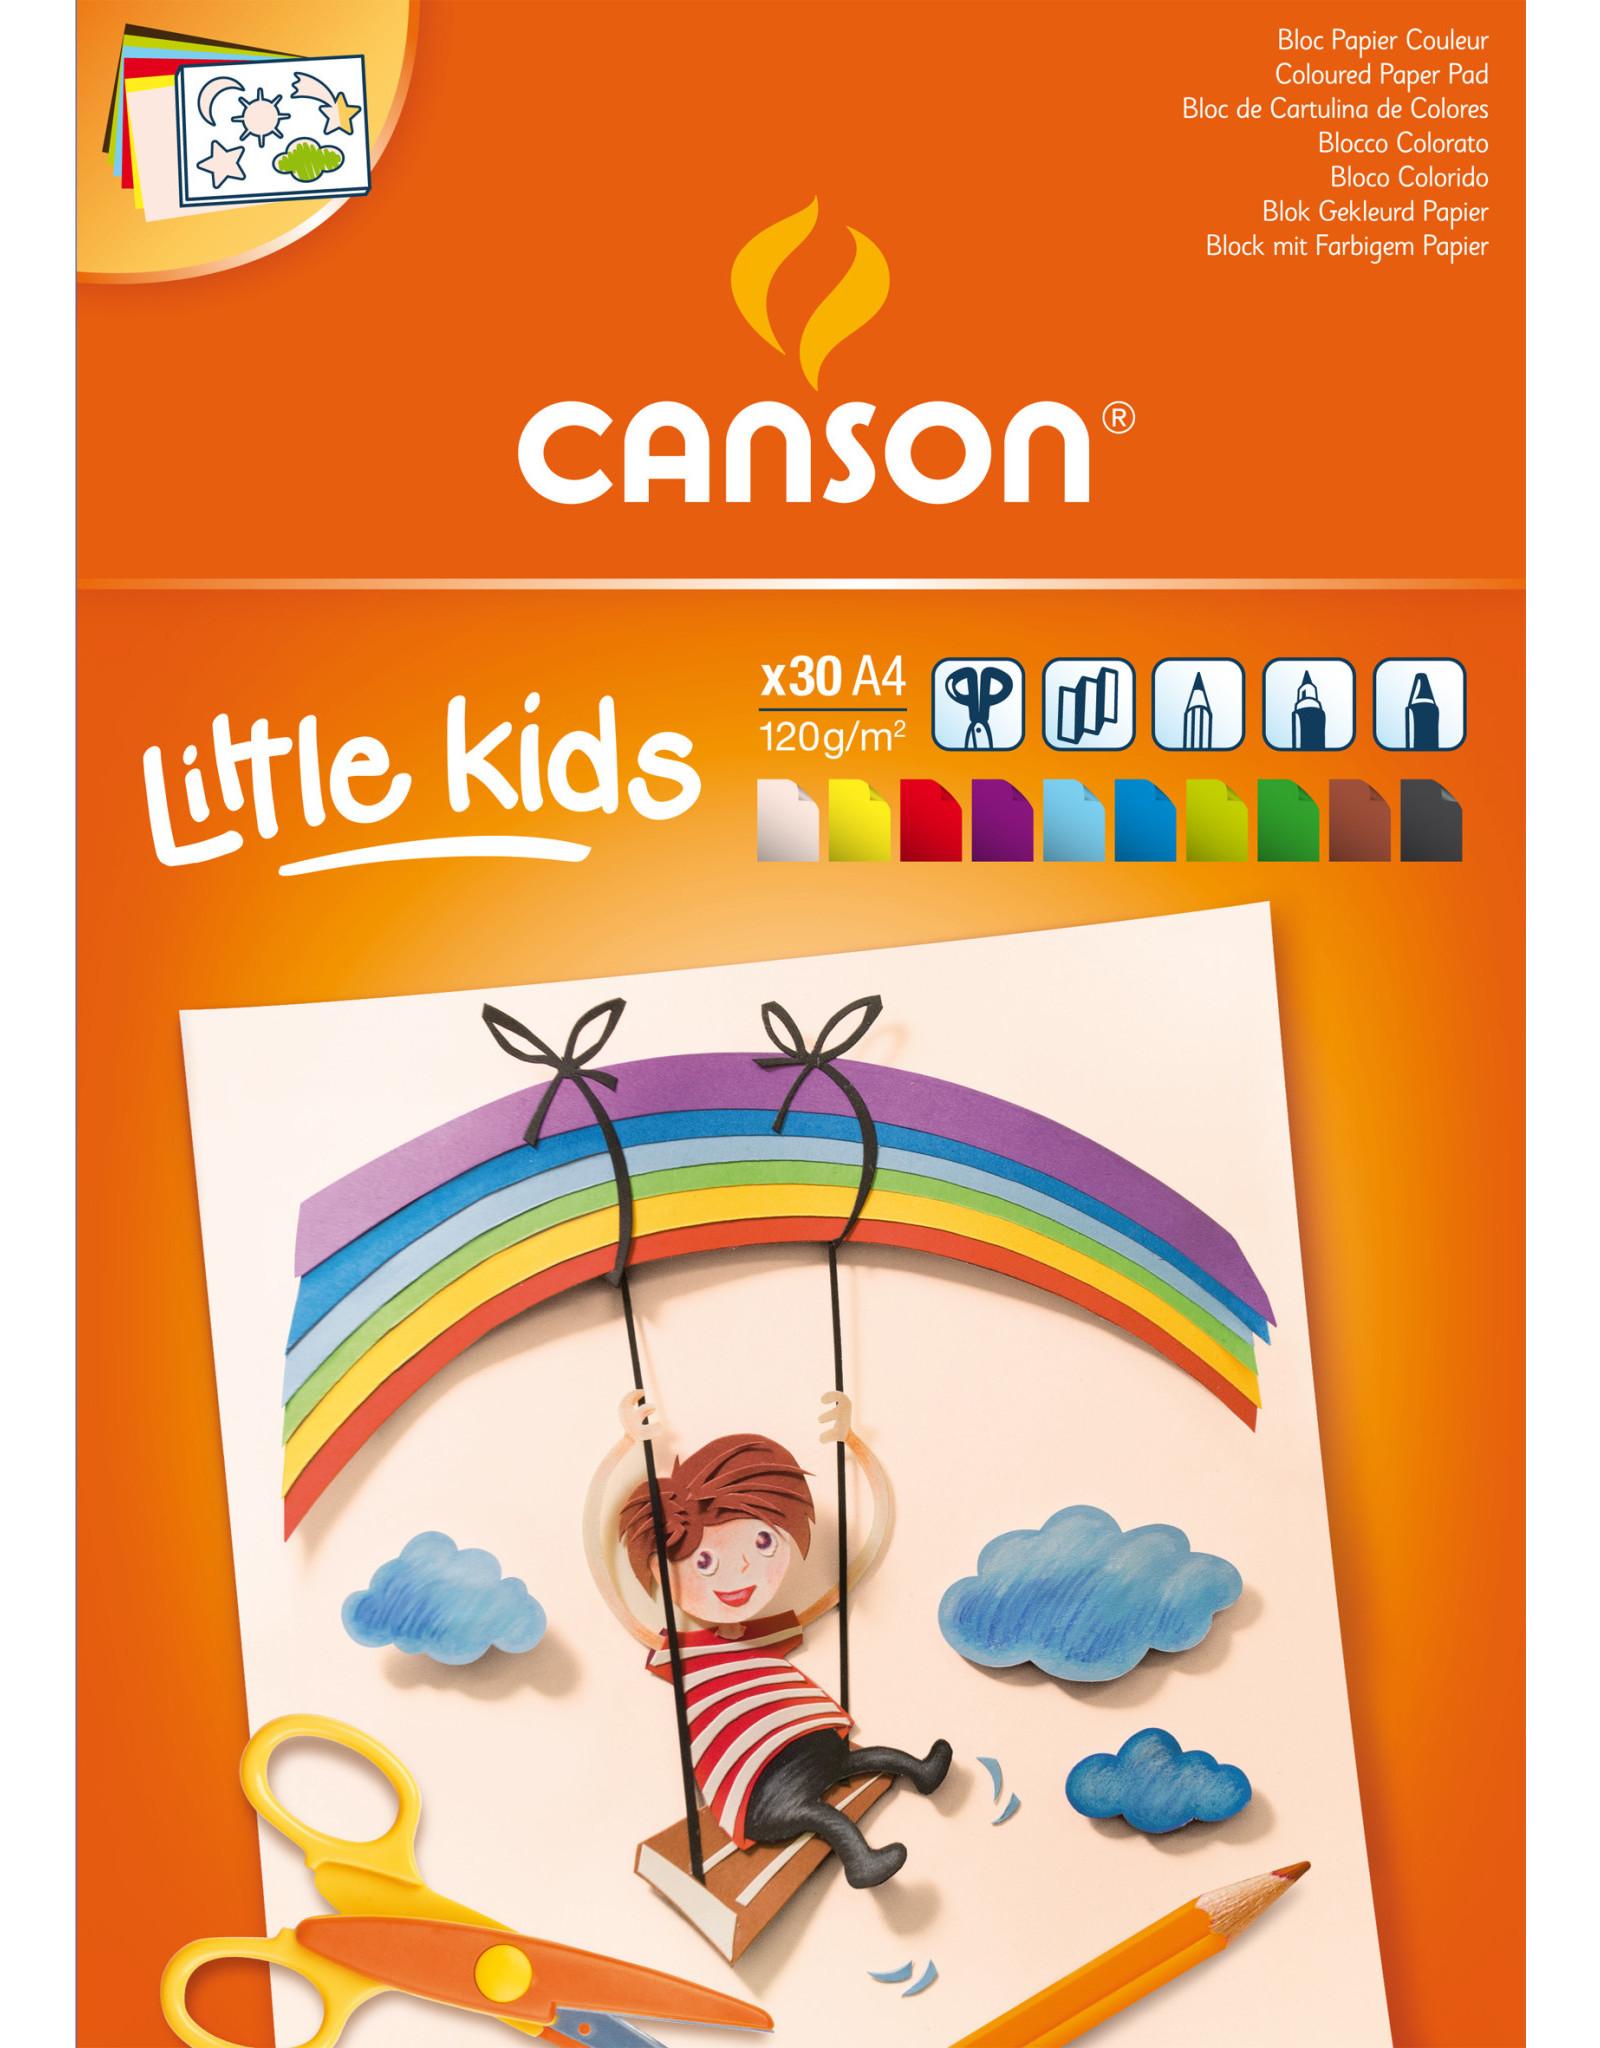 canson Little kids gekleurd papier 120 gr